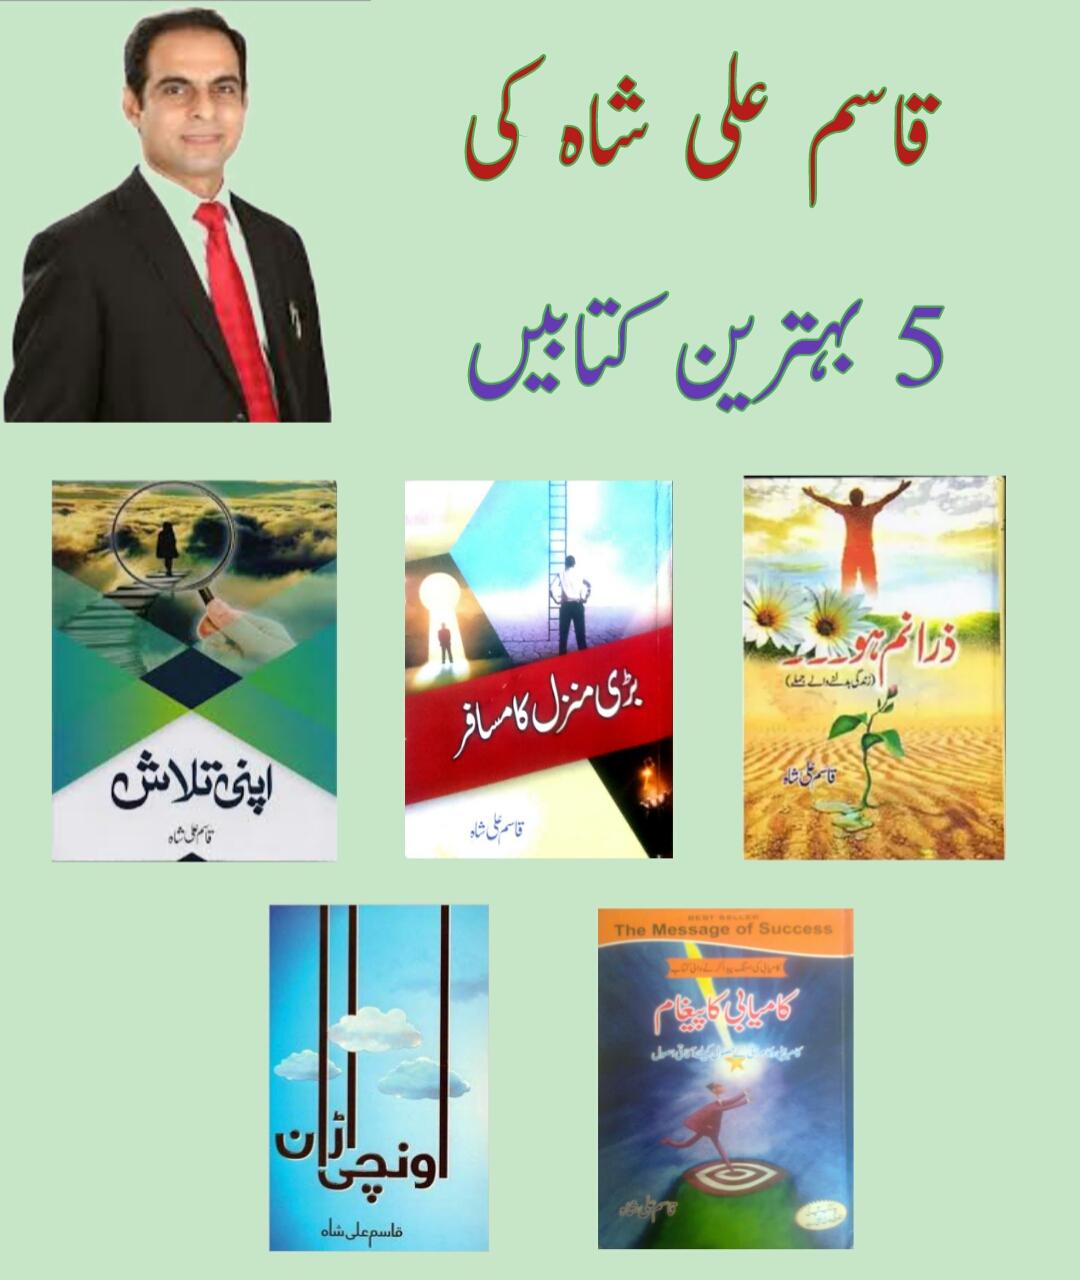 Top 5 Qasim Ali Shah Books in Urdu - Pdf Free Download